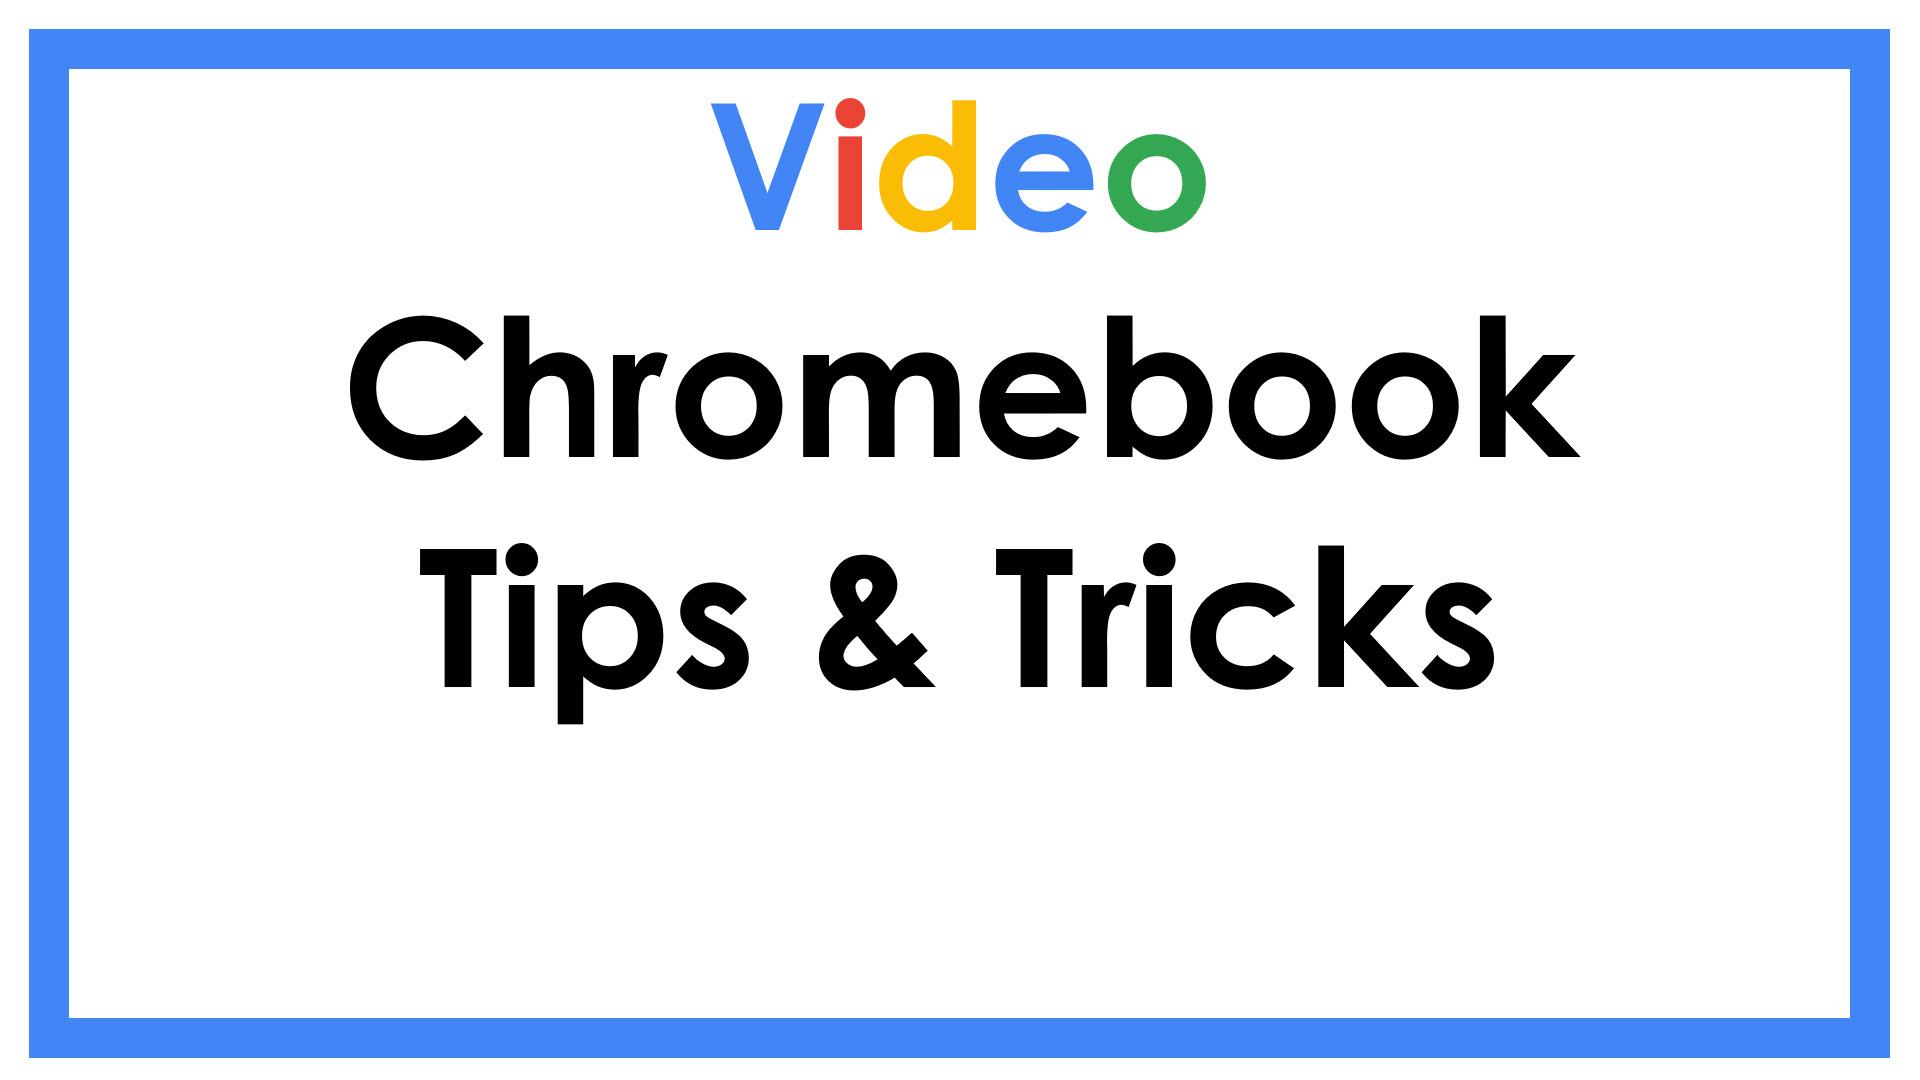 Video Chromebook Tips & Tricks